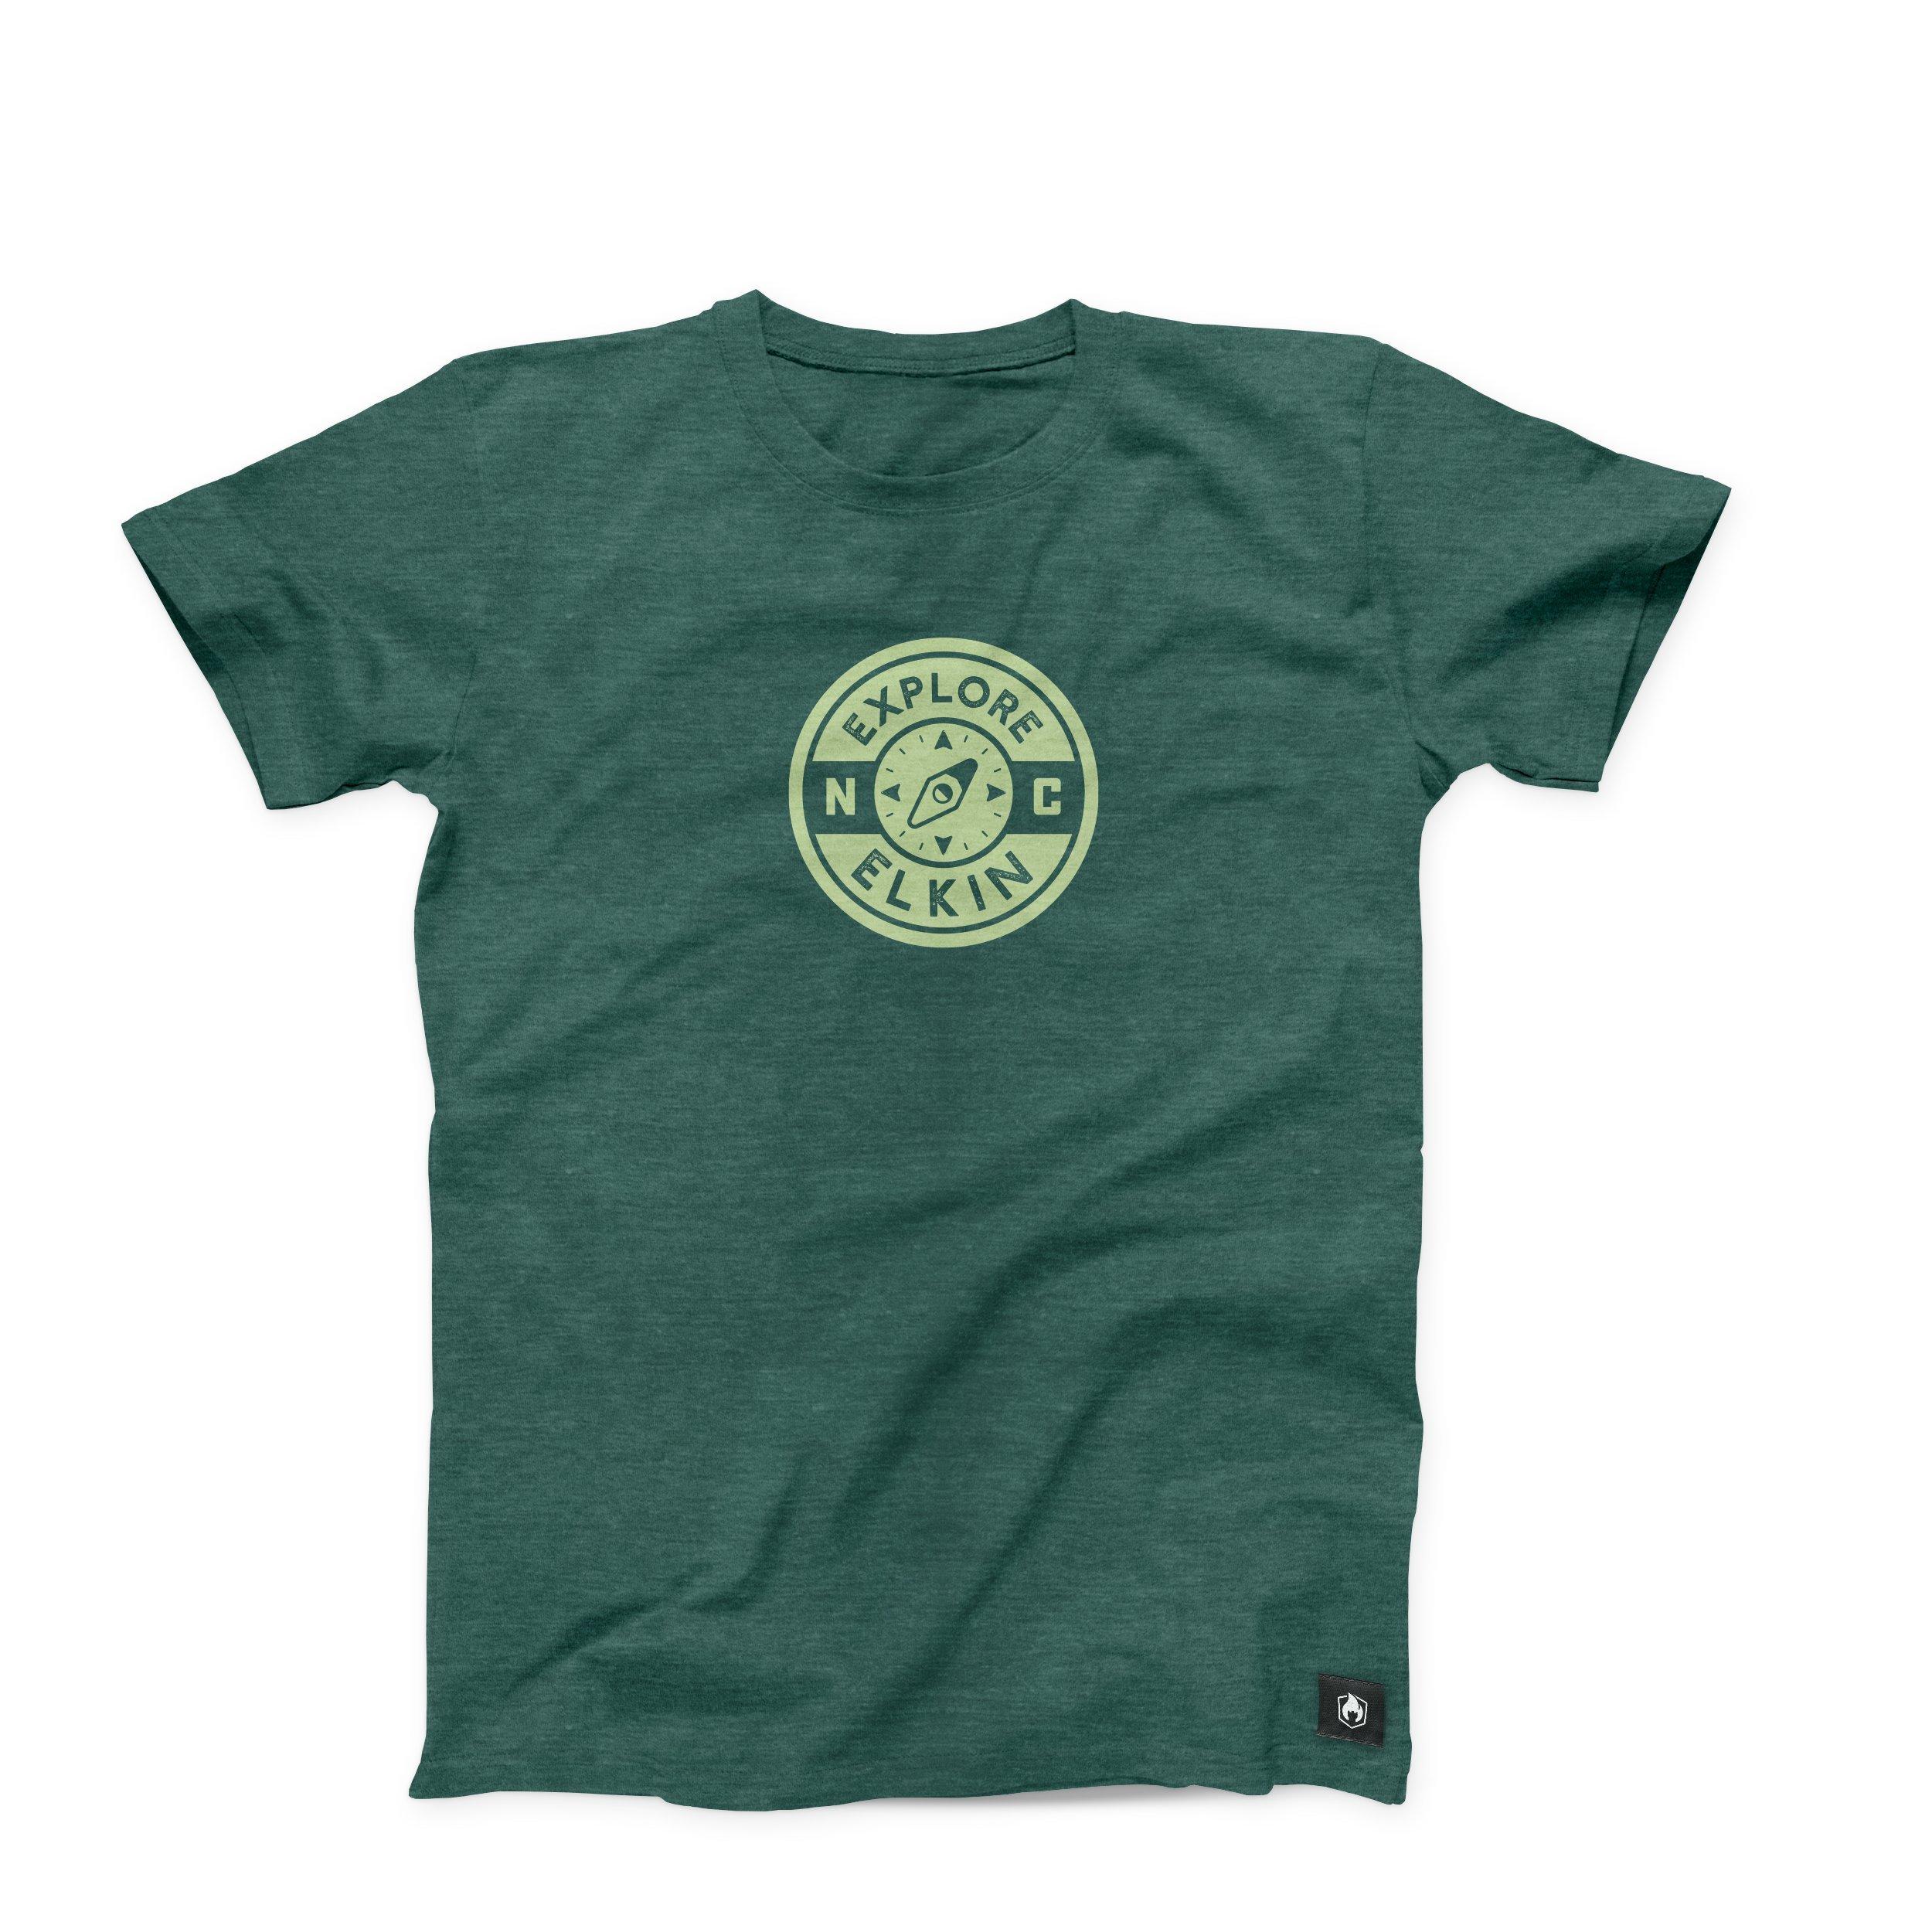 Elkin t-shirt mockup